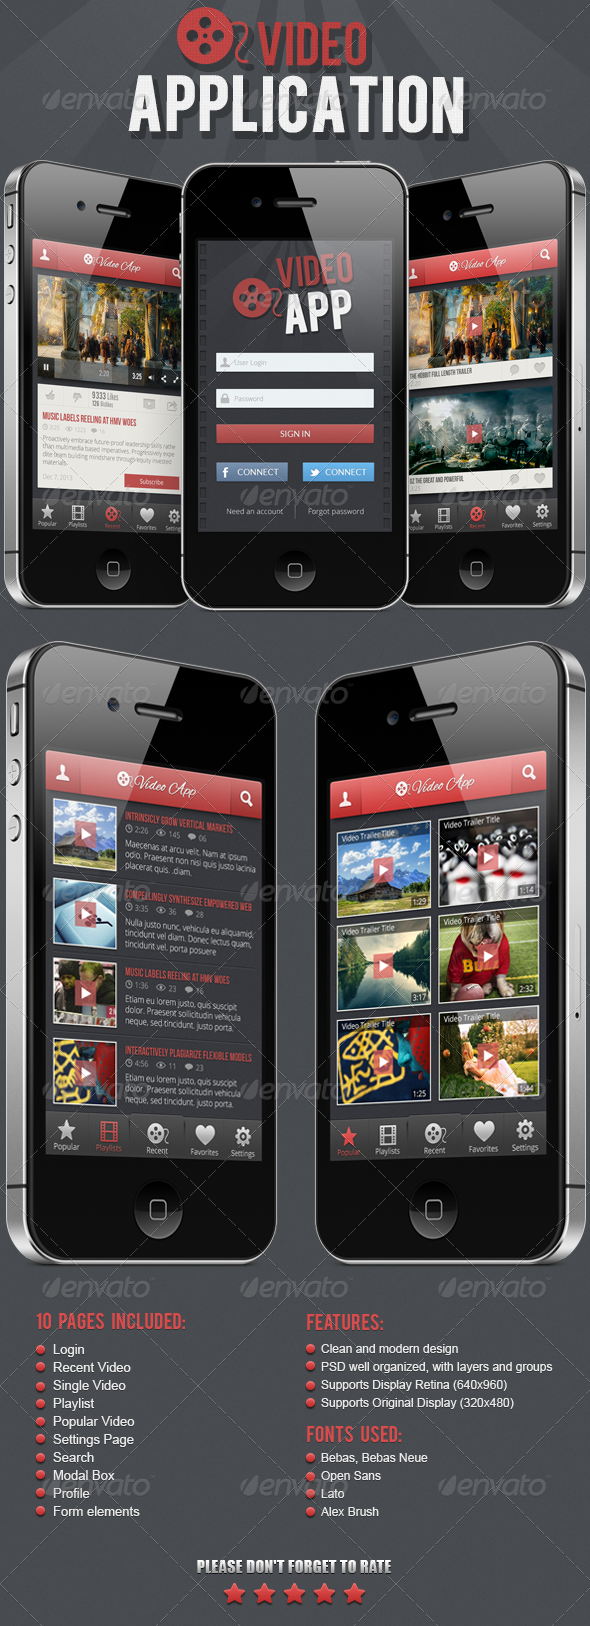 GraphicRiver Video Application 4828830